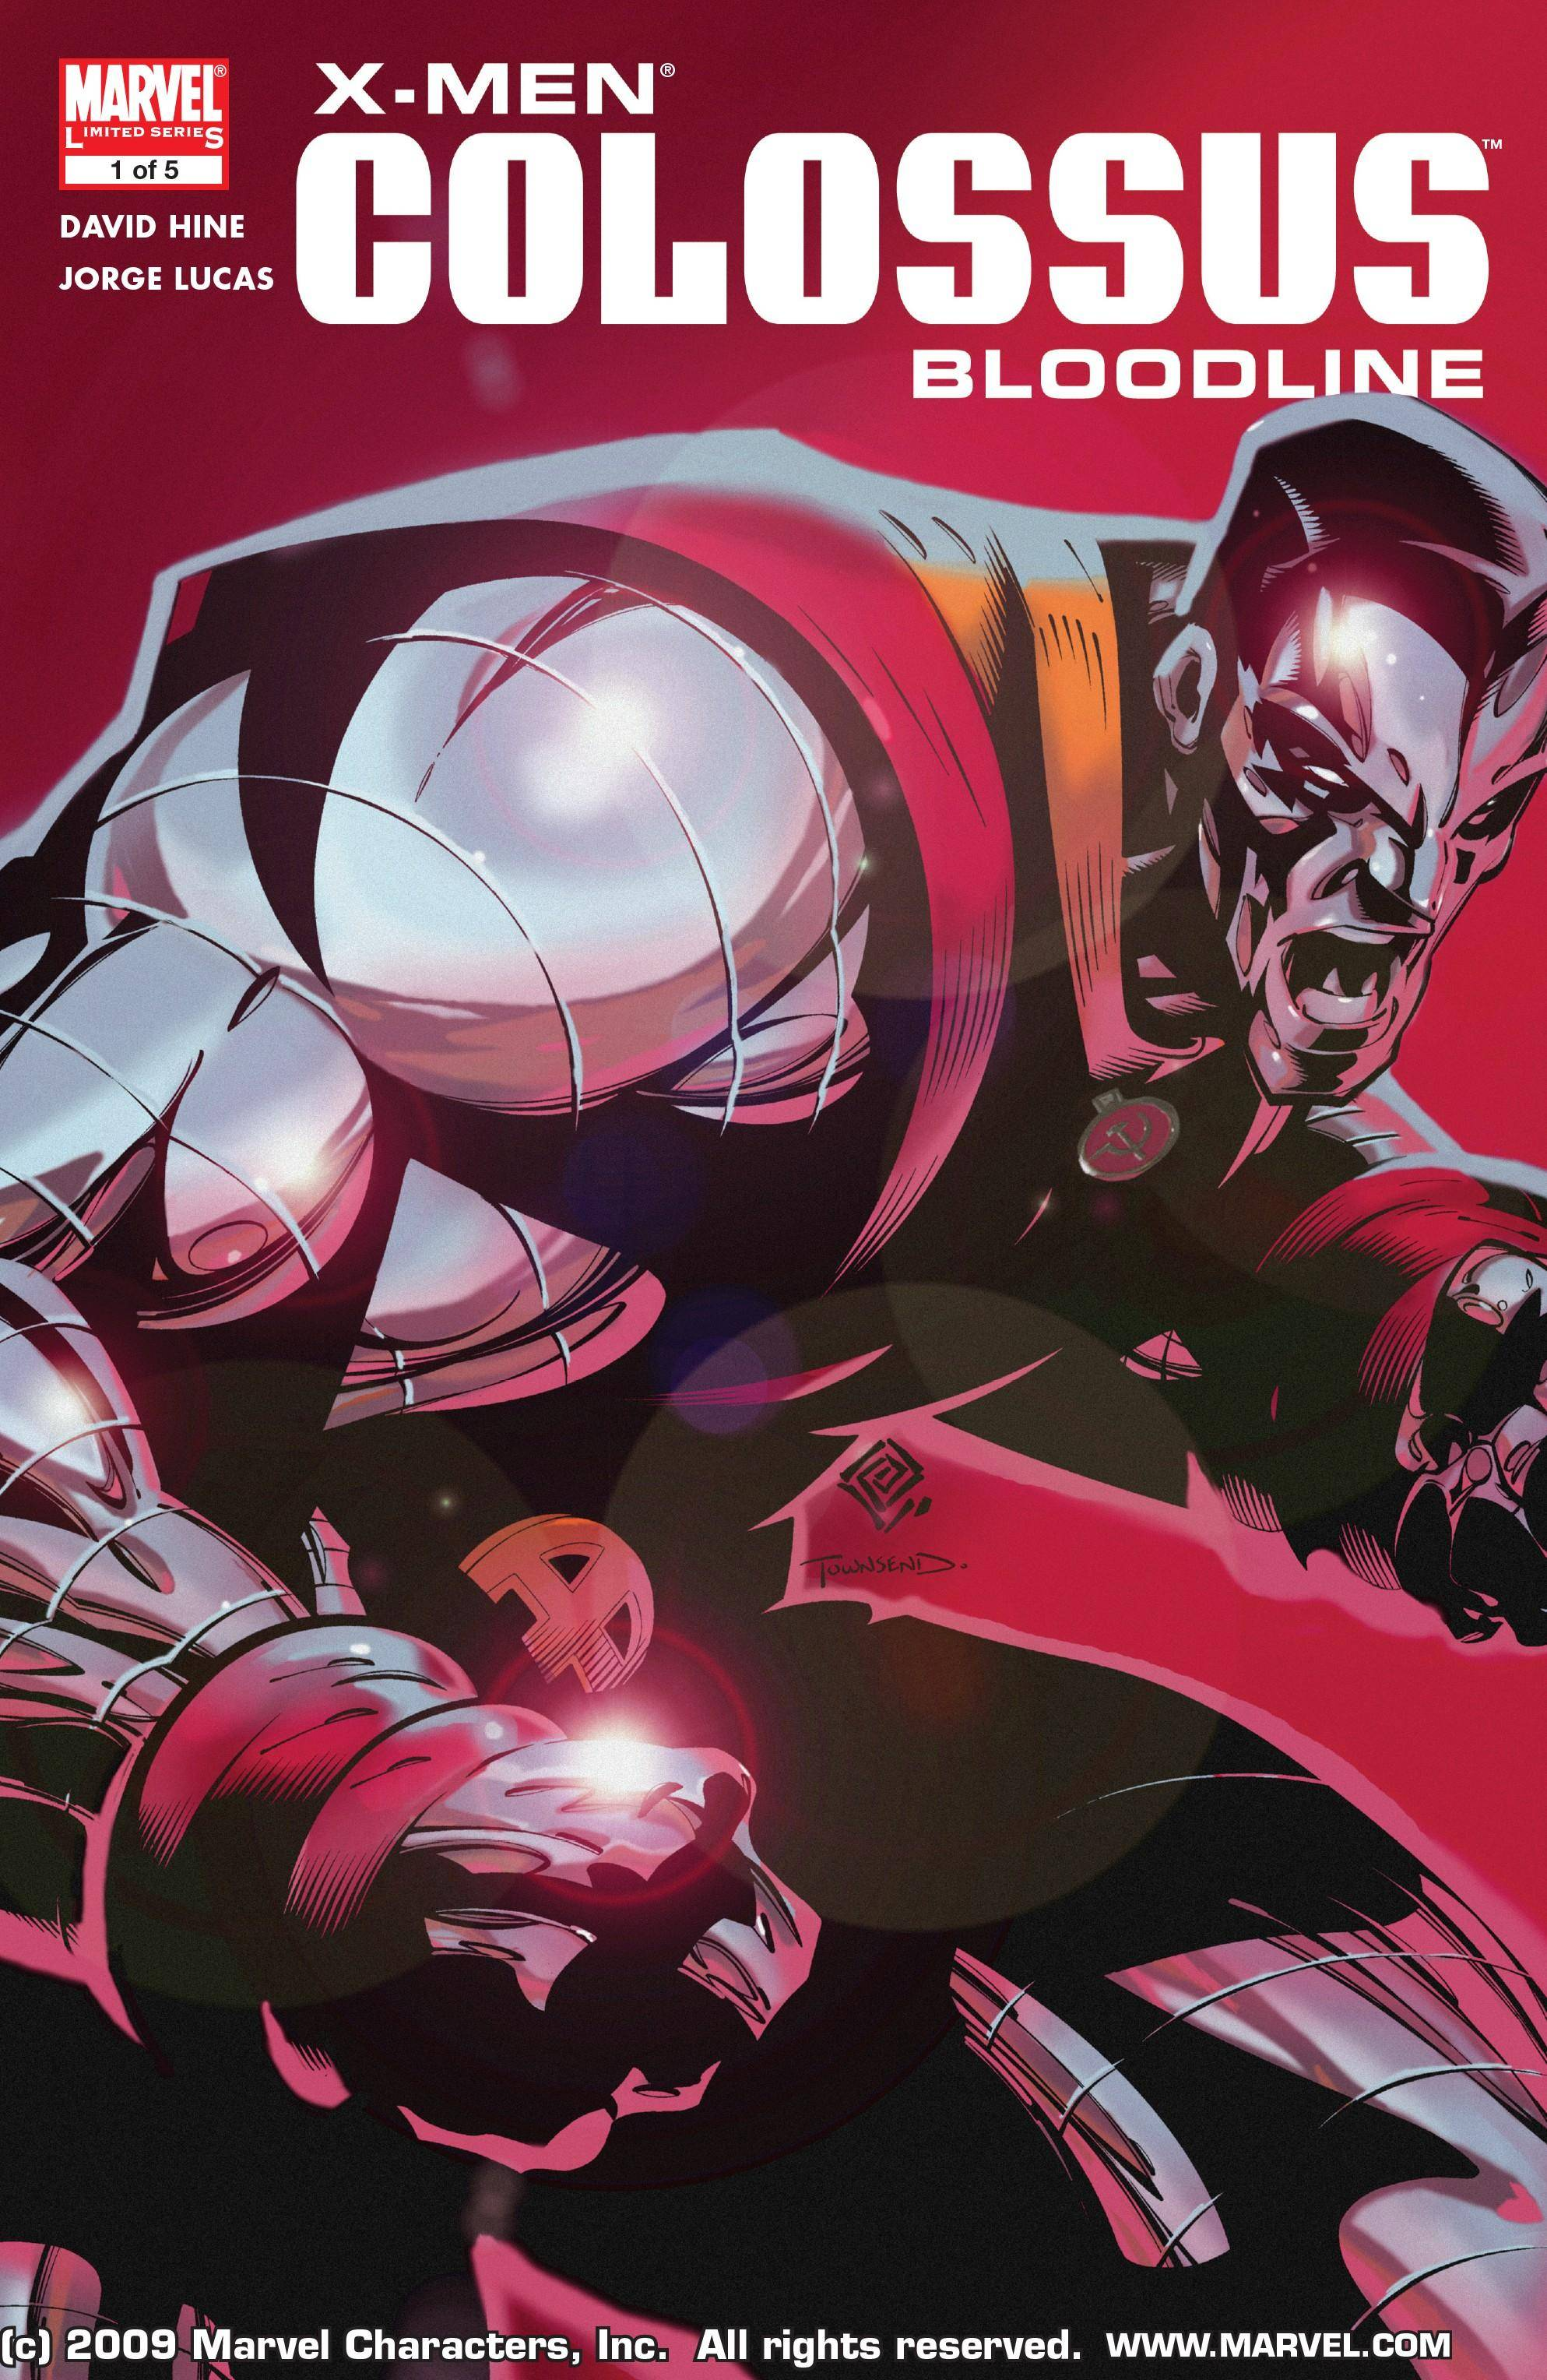 X-Men-Colossus.Bloodline.01.of.05.2005.Digital-Empire